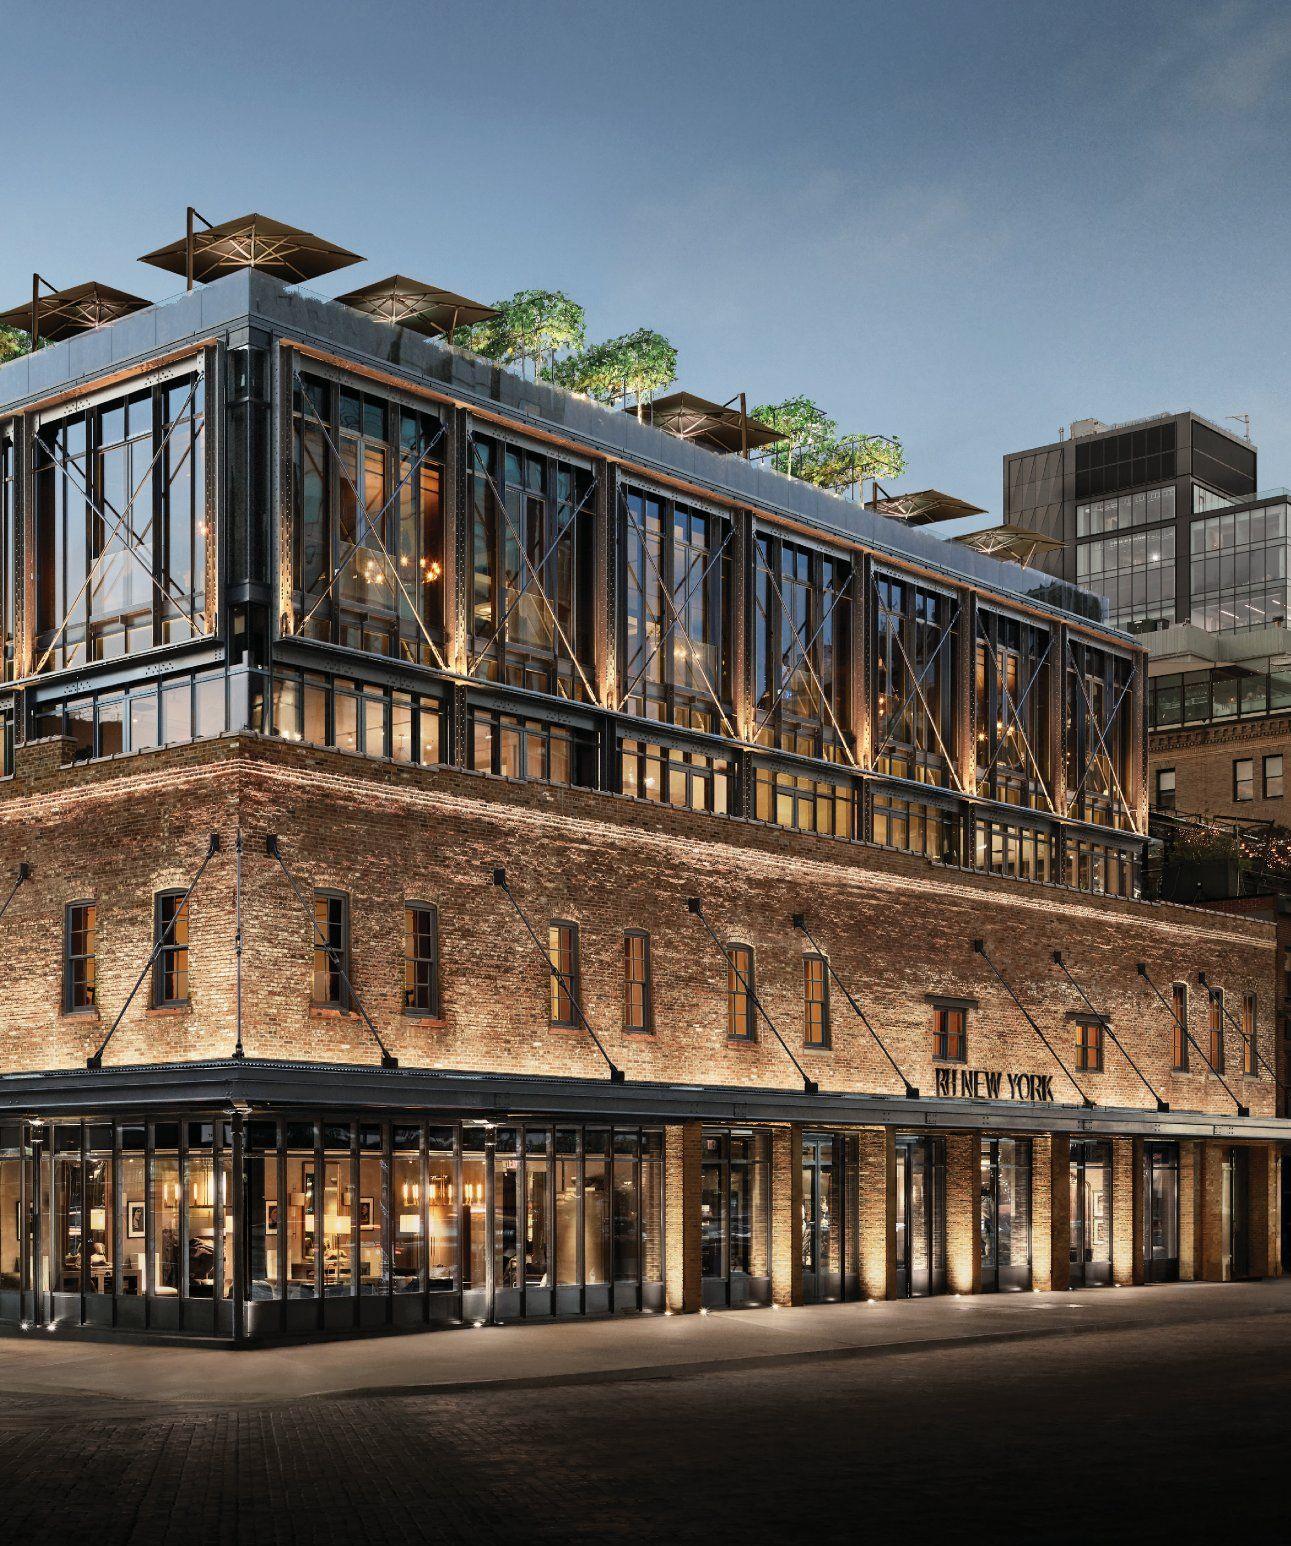 Restoration Hardware New York Rooftop: #RestorationHardware #NY #US Anchor Building Is In 150